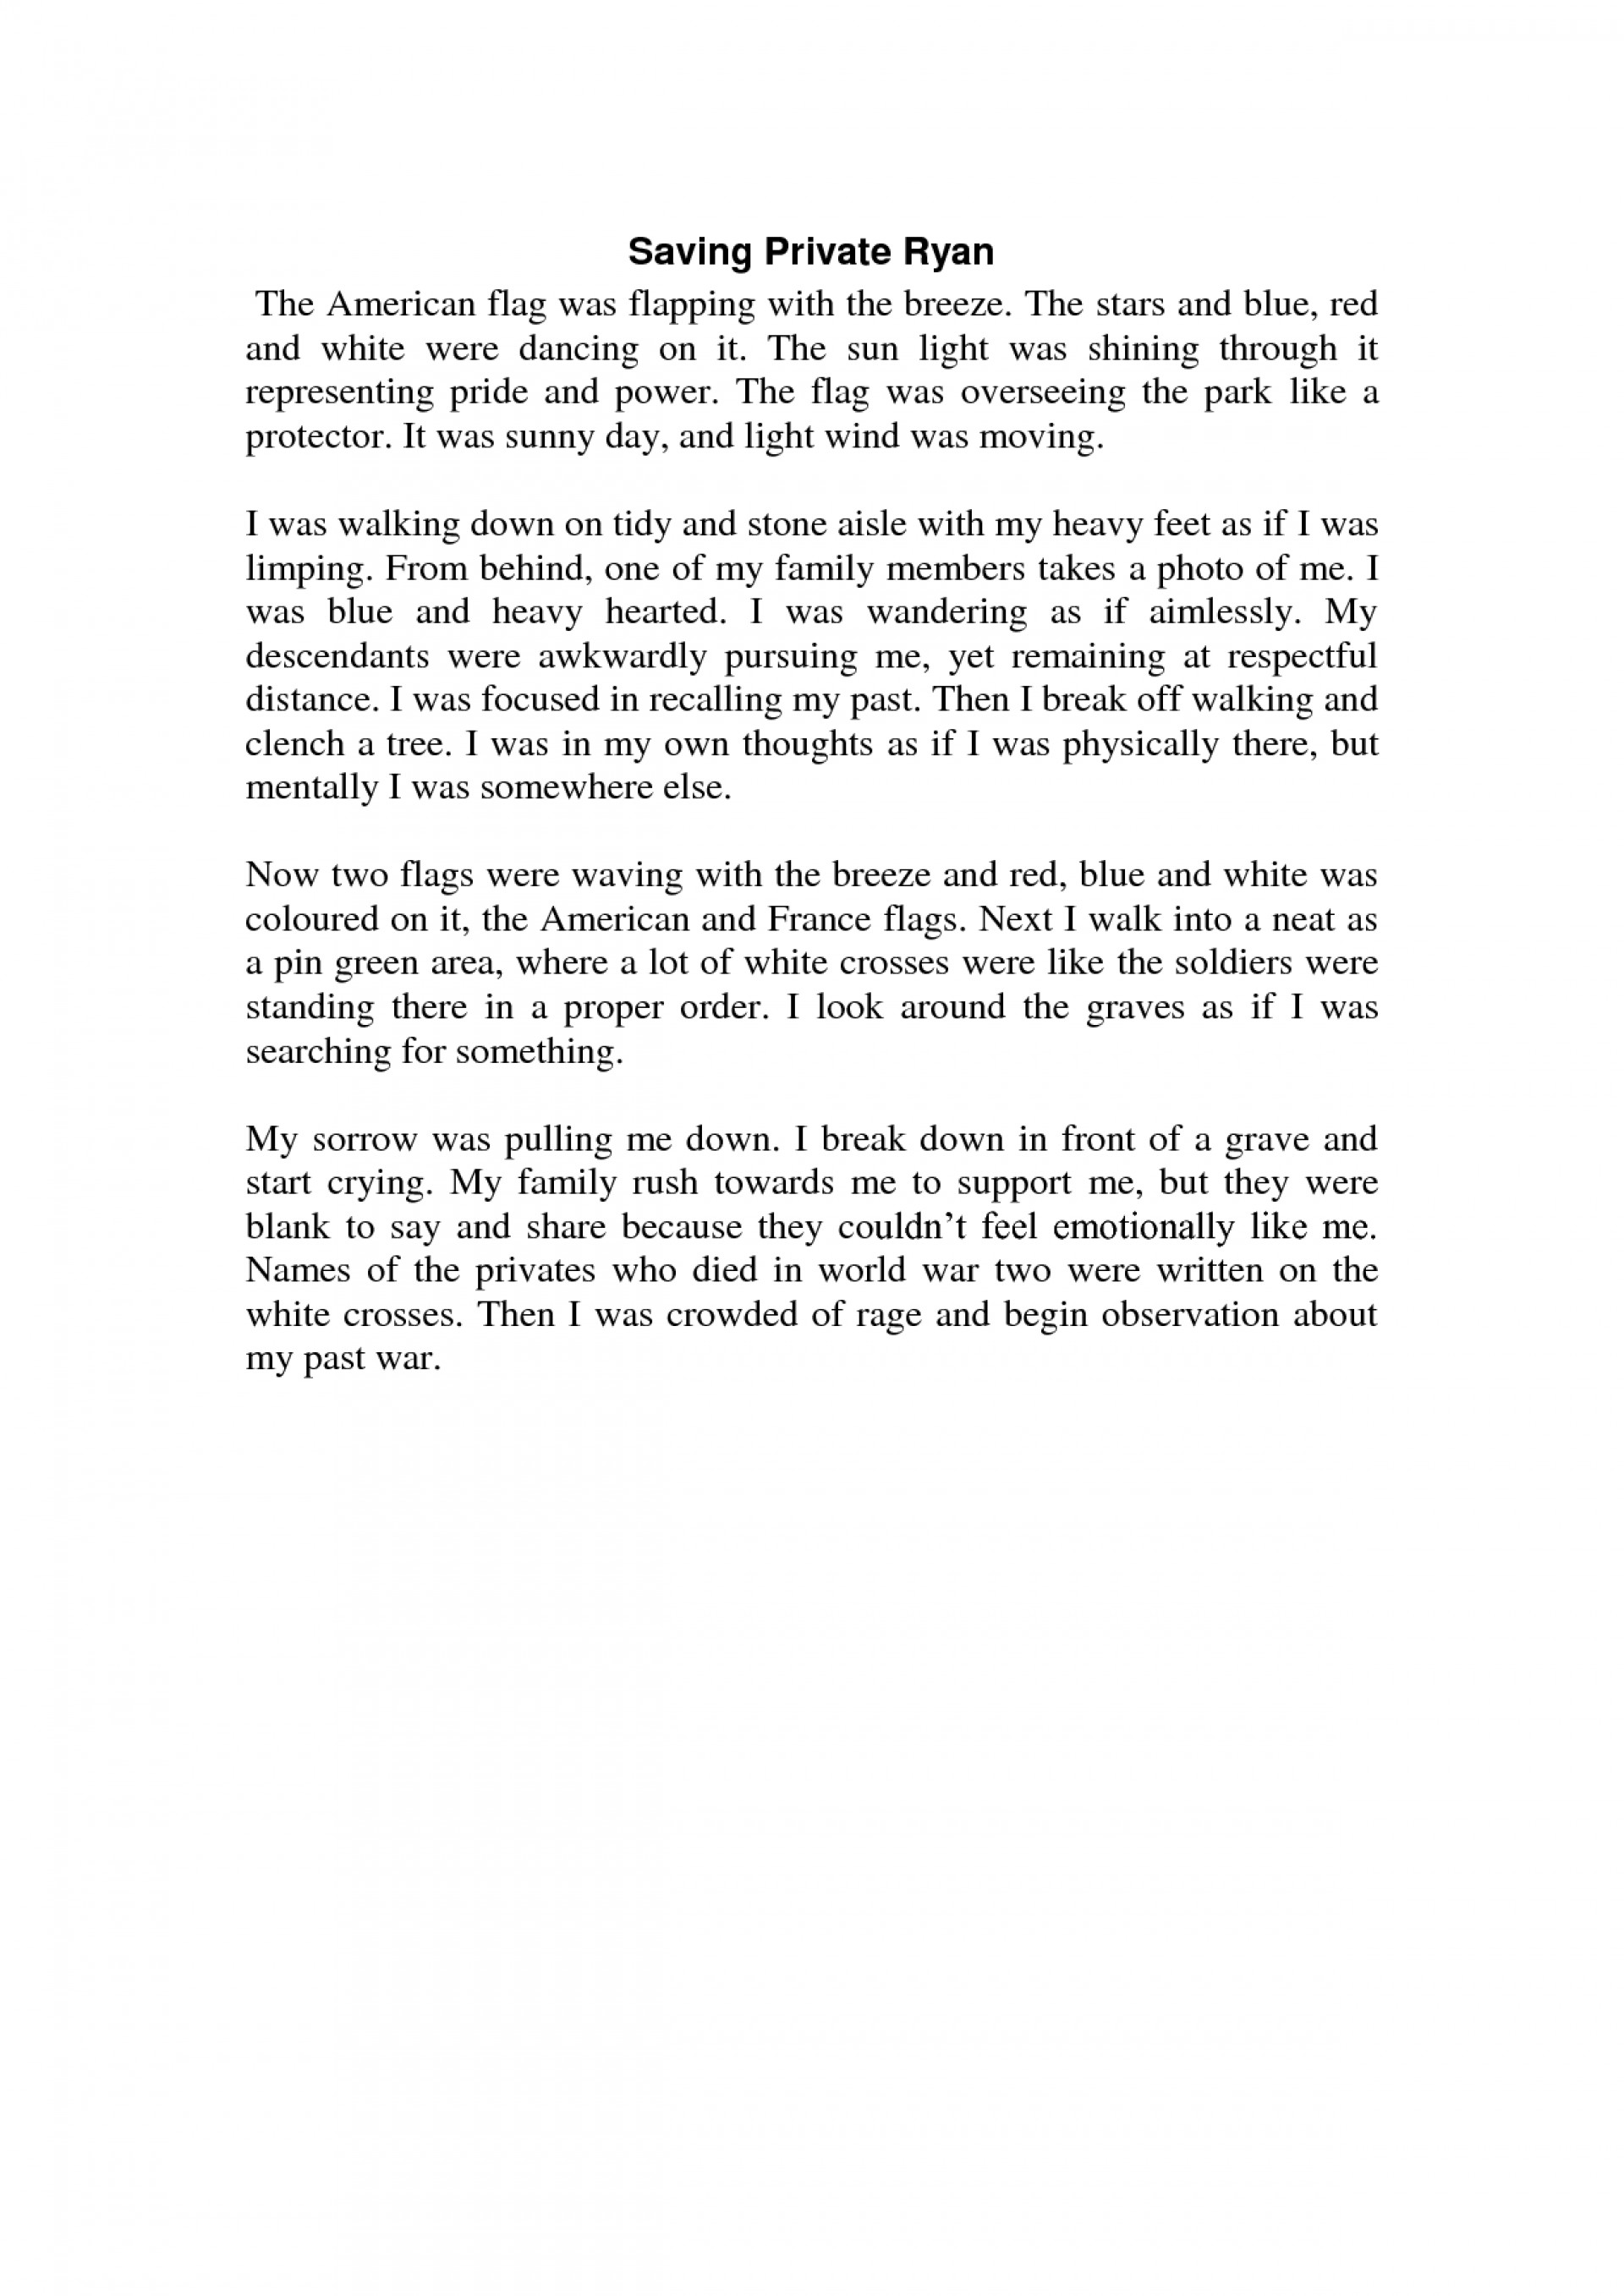 010 Ym0xfghxoc Define Narrative Essay Fascinating Literacy The Term 1920